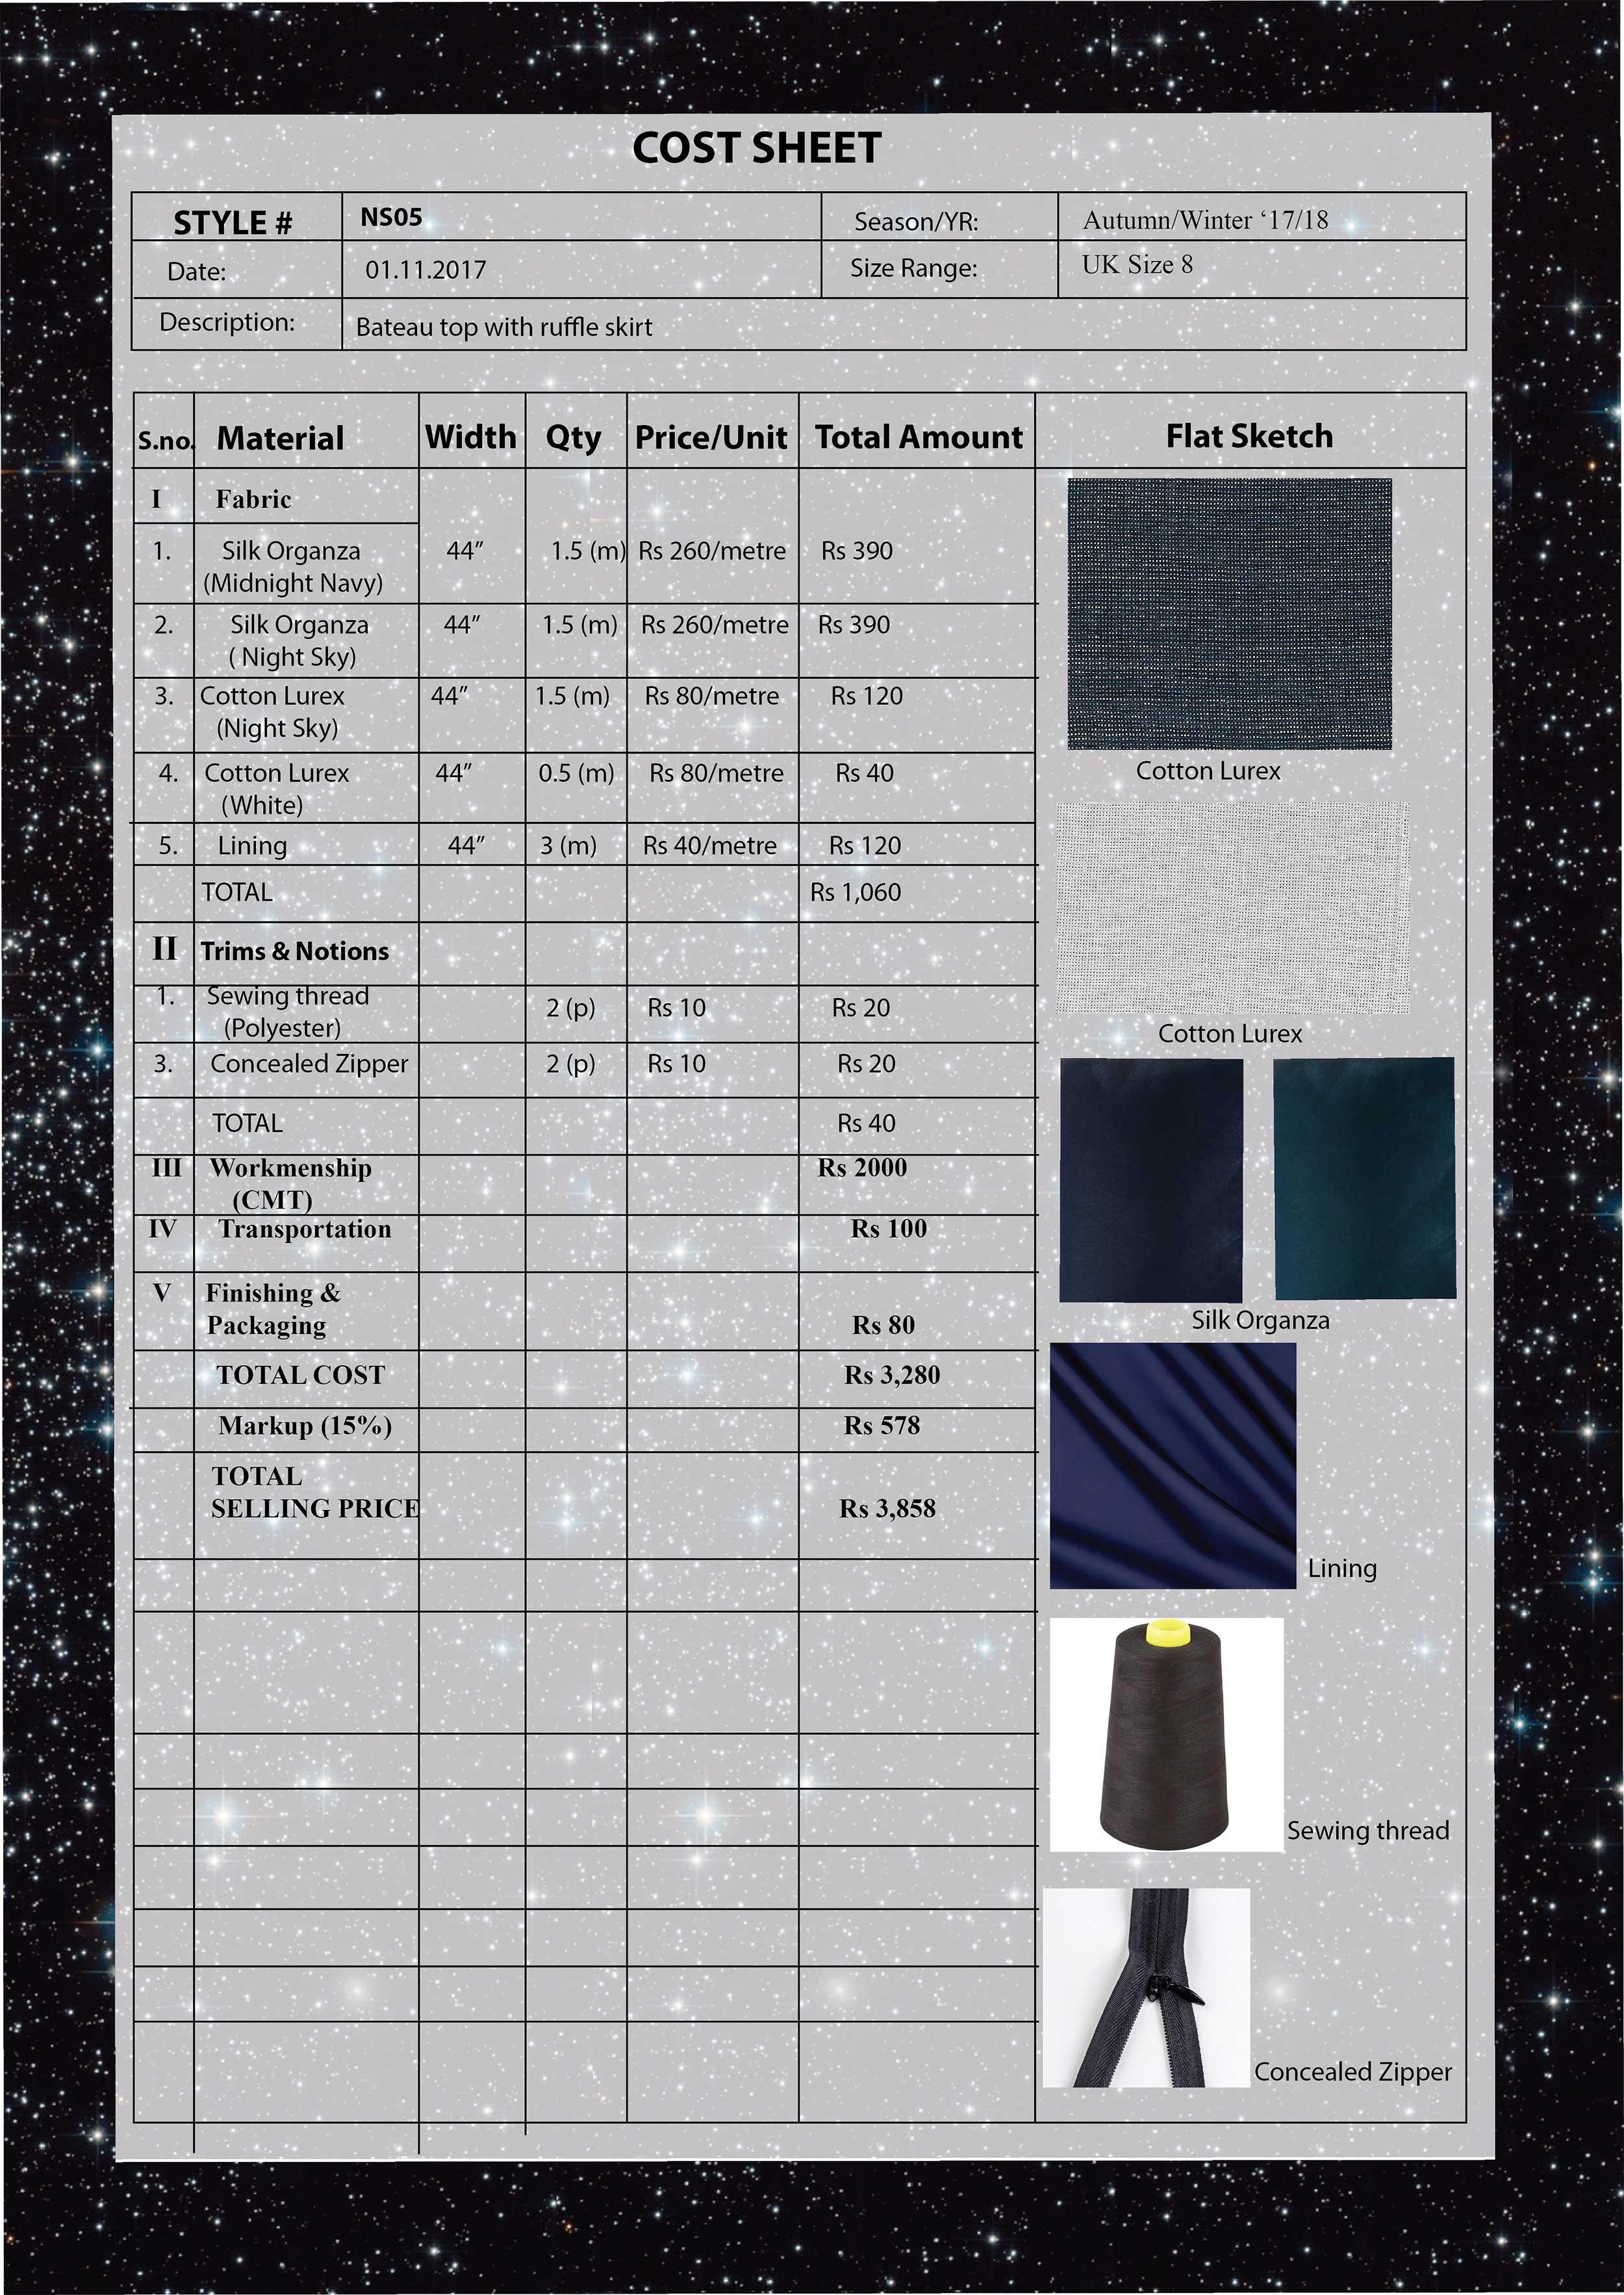 Cost Sheet-Bateau Top with Ruffle Skirt